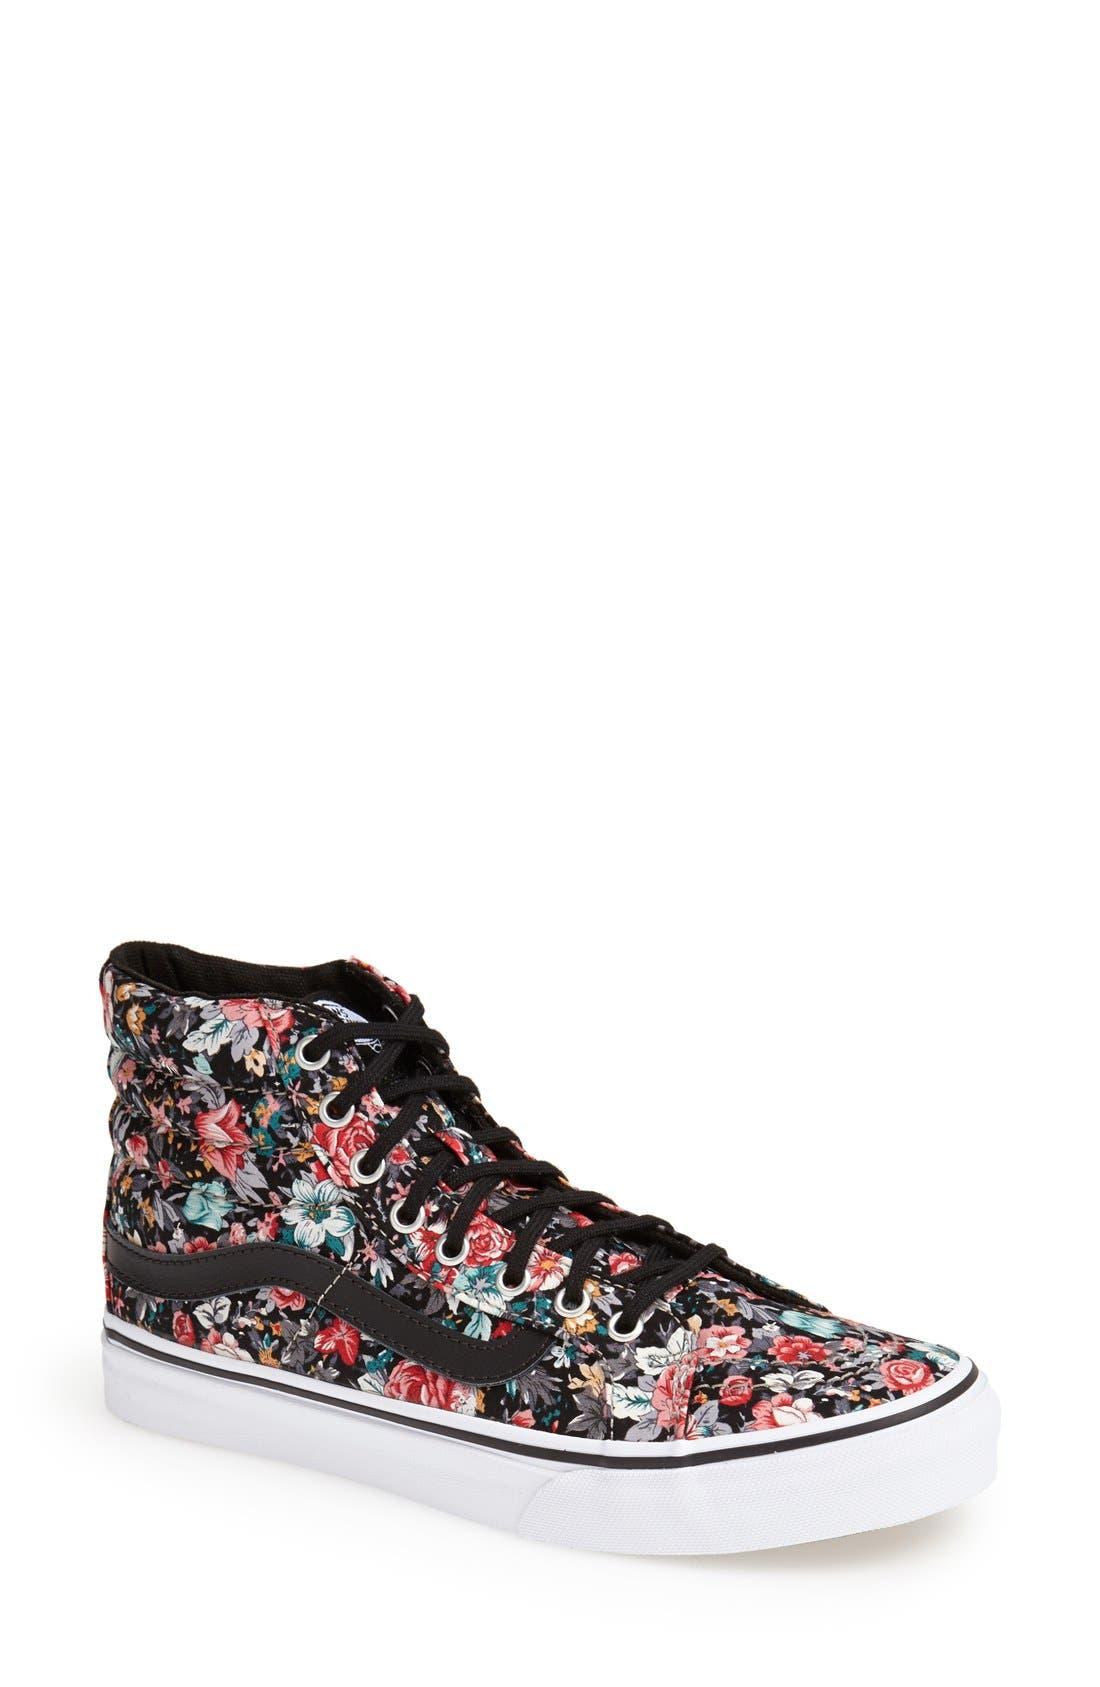 Alternate Image 1 Selected - Vans 'Sk8-Hi - Slim' Sneaker (Women)